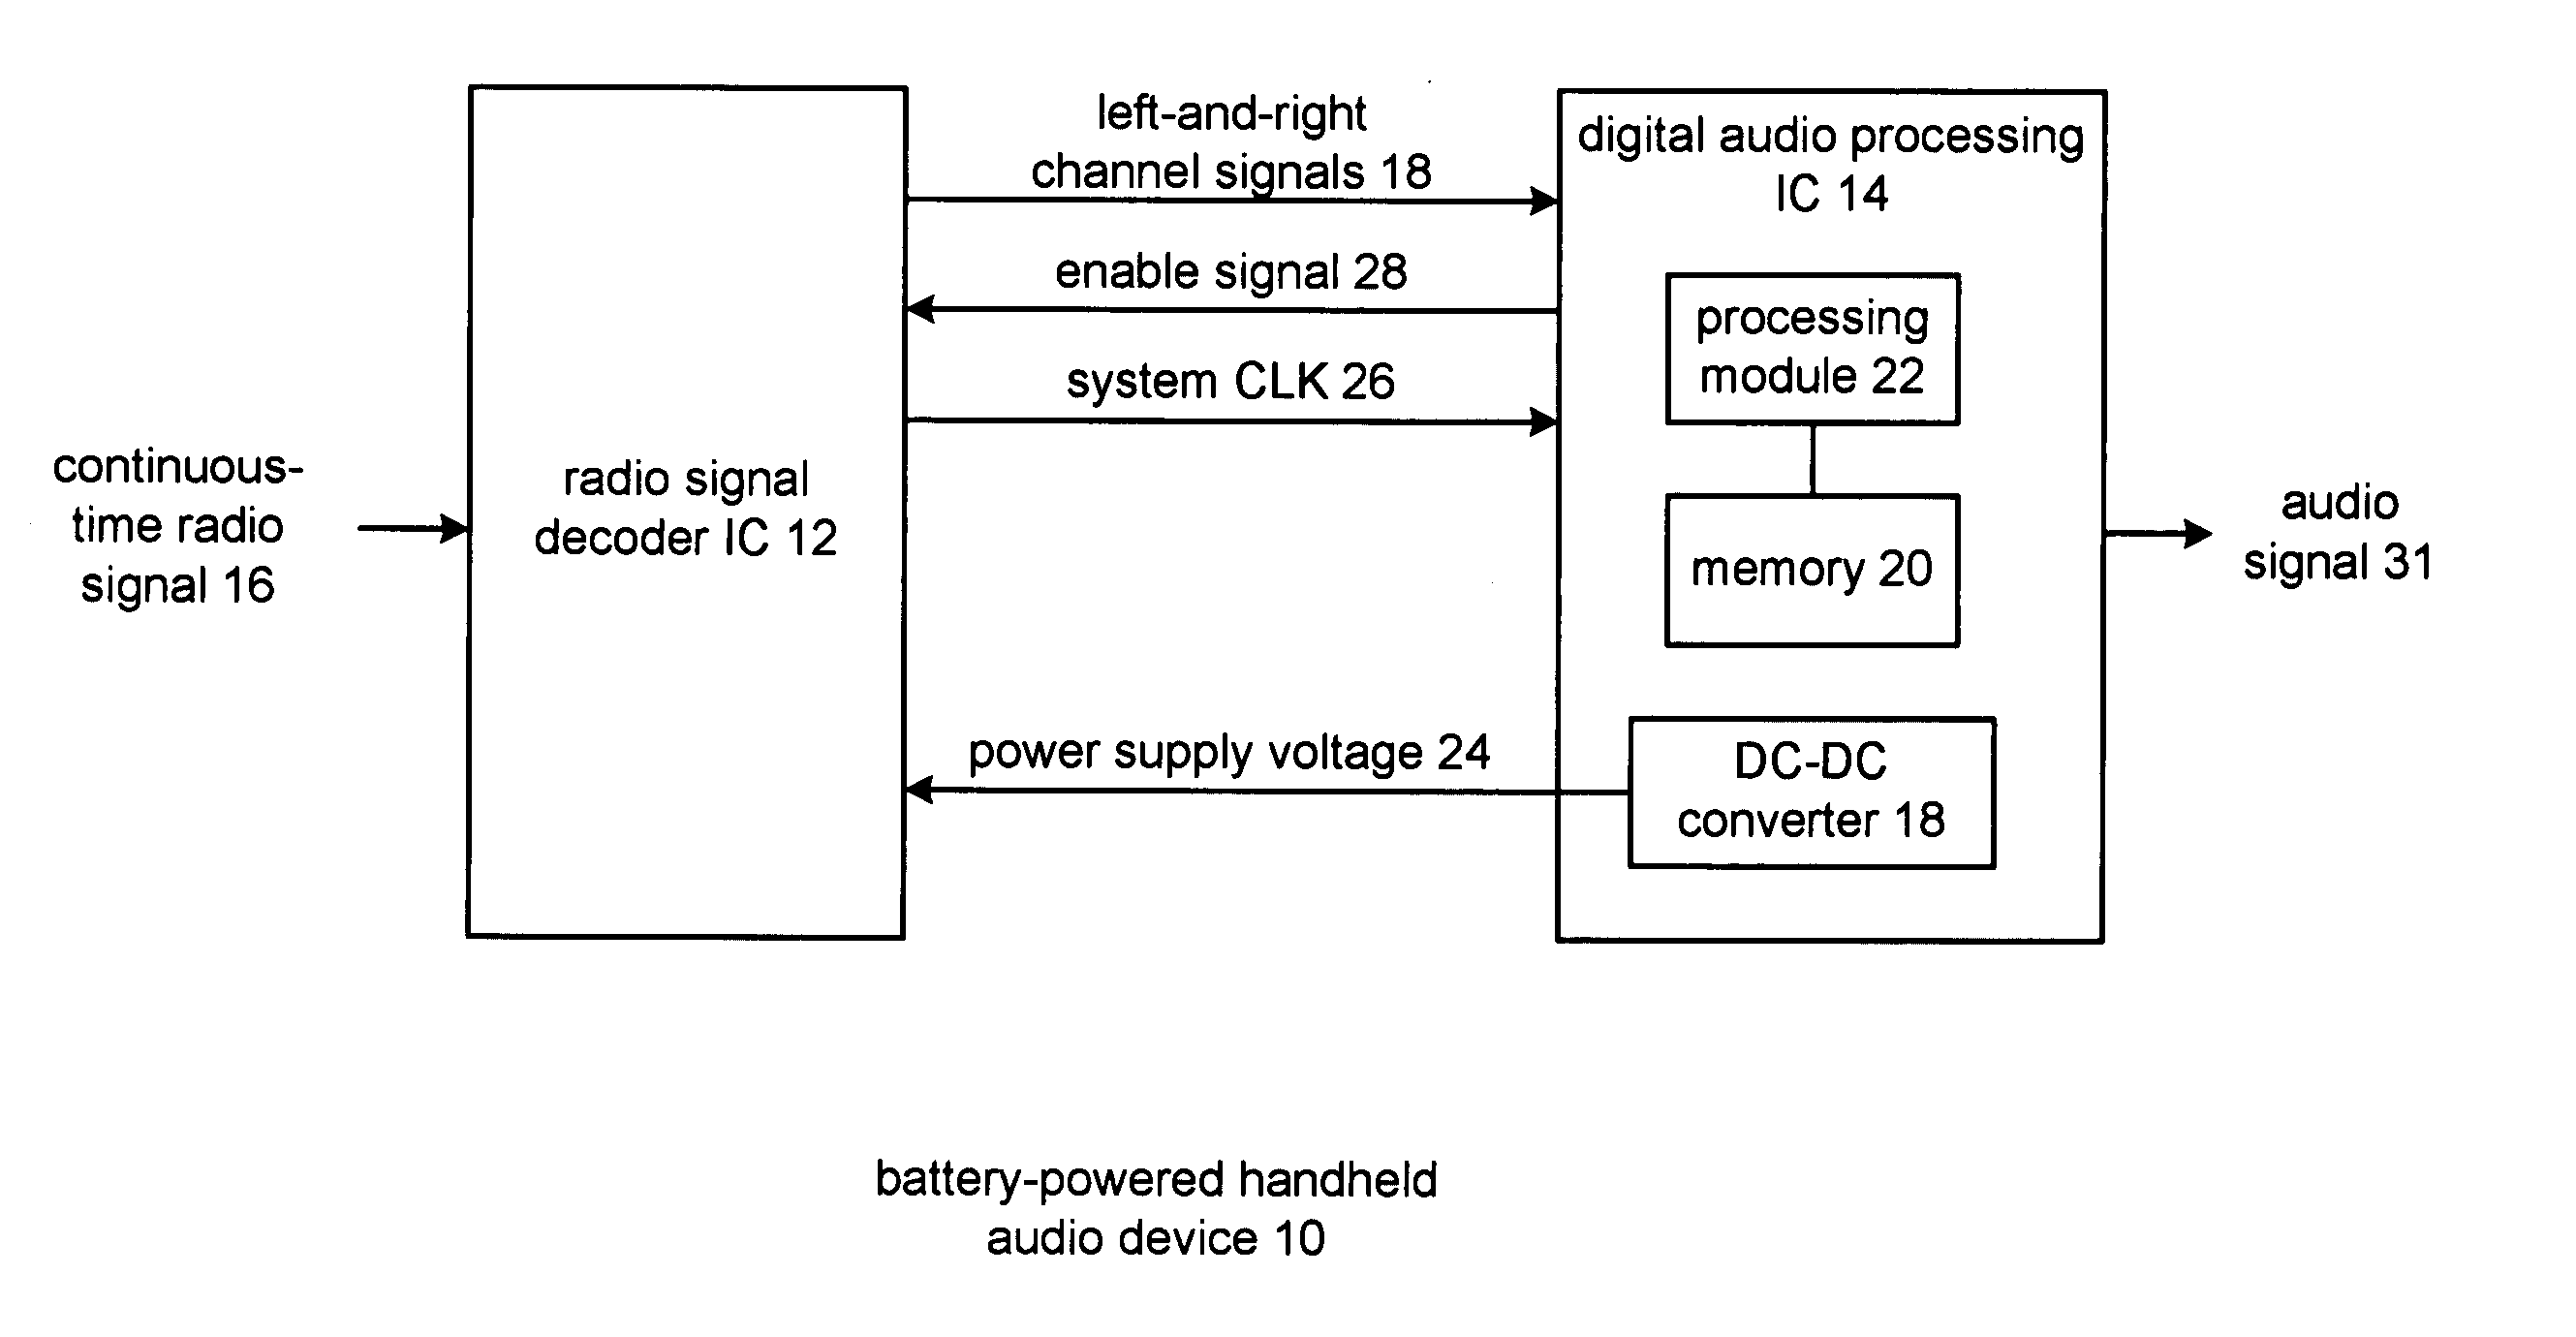 براءة الاختراع US20070099591 - Power management for a battery